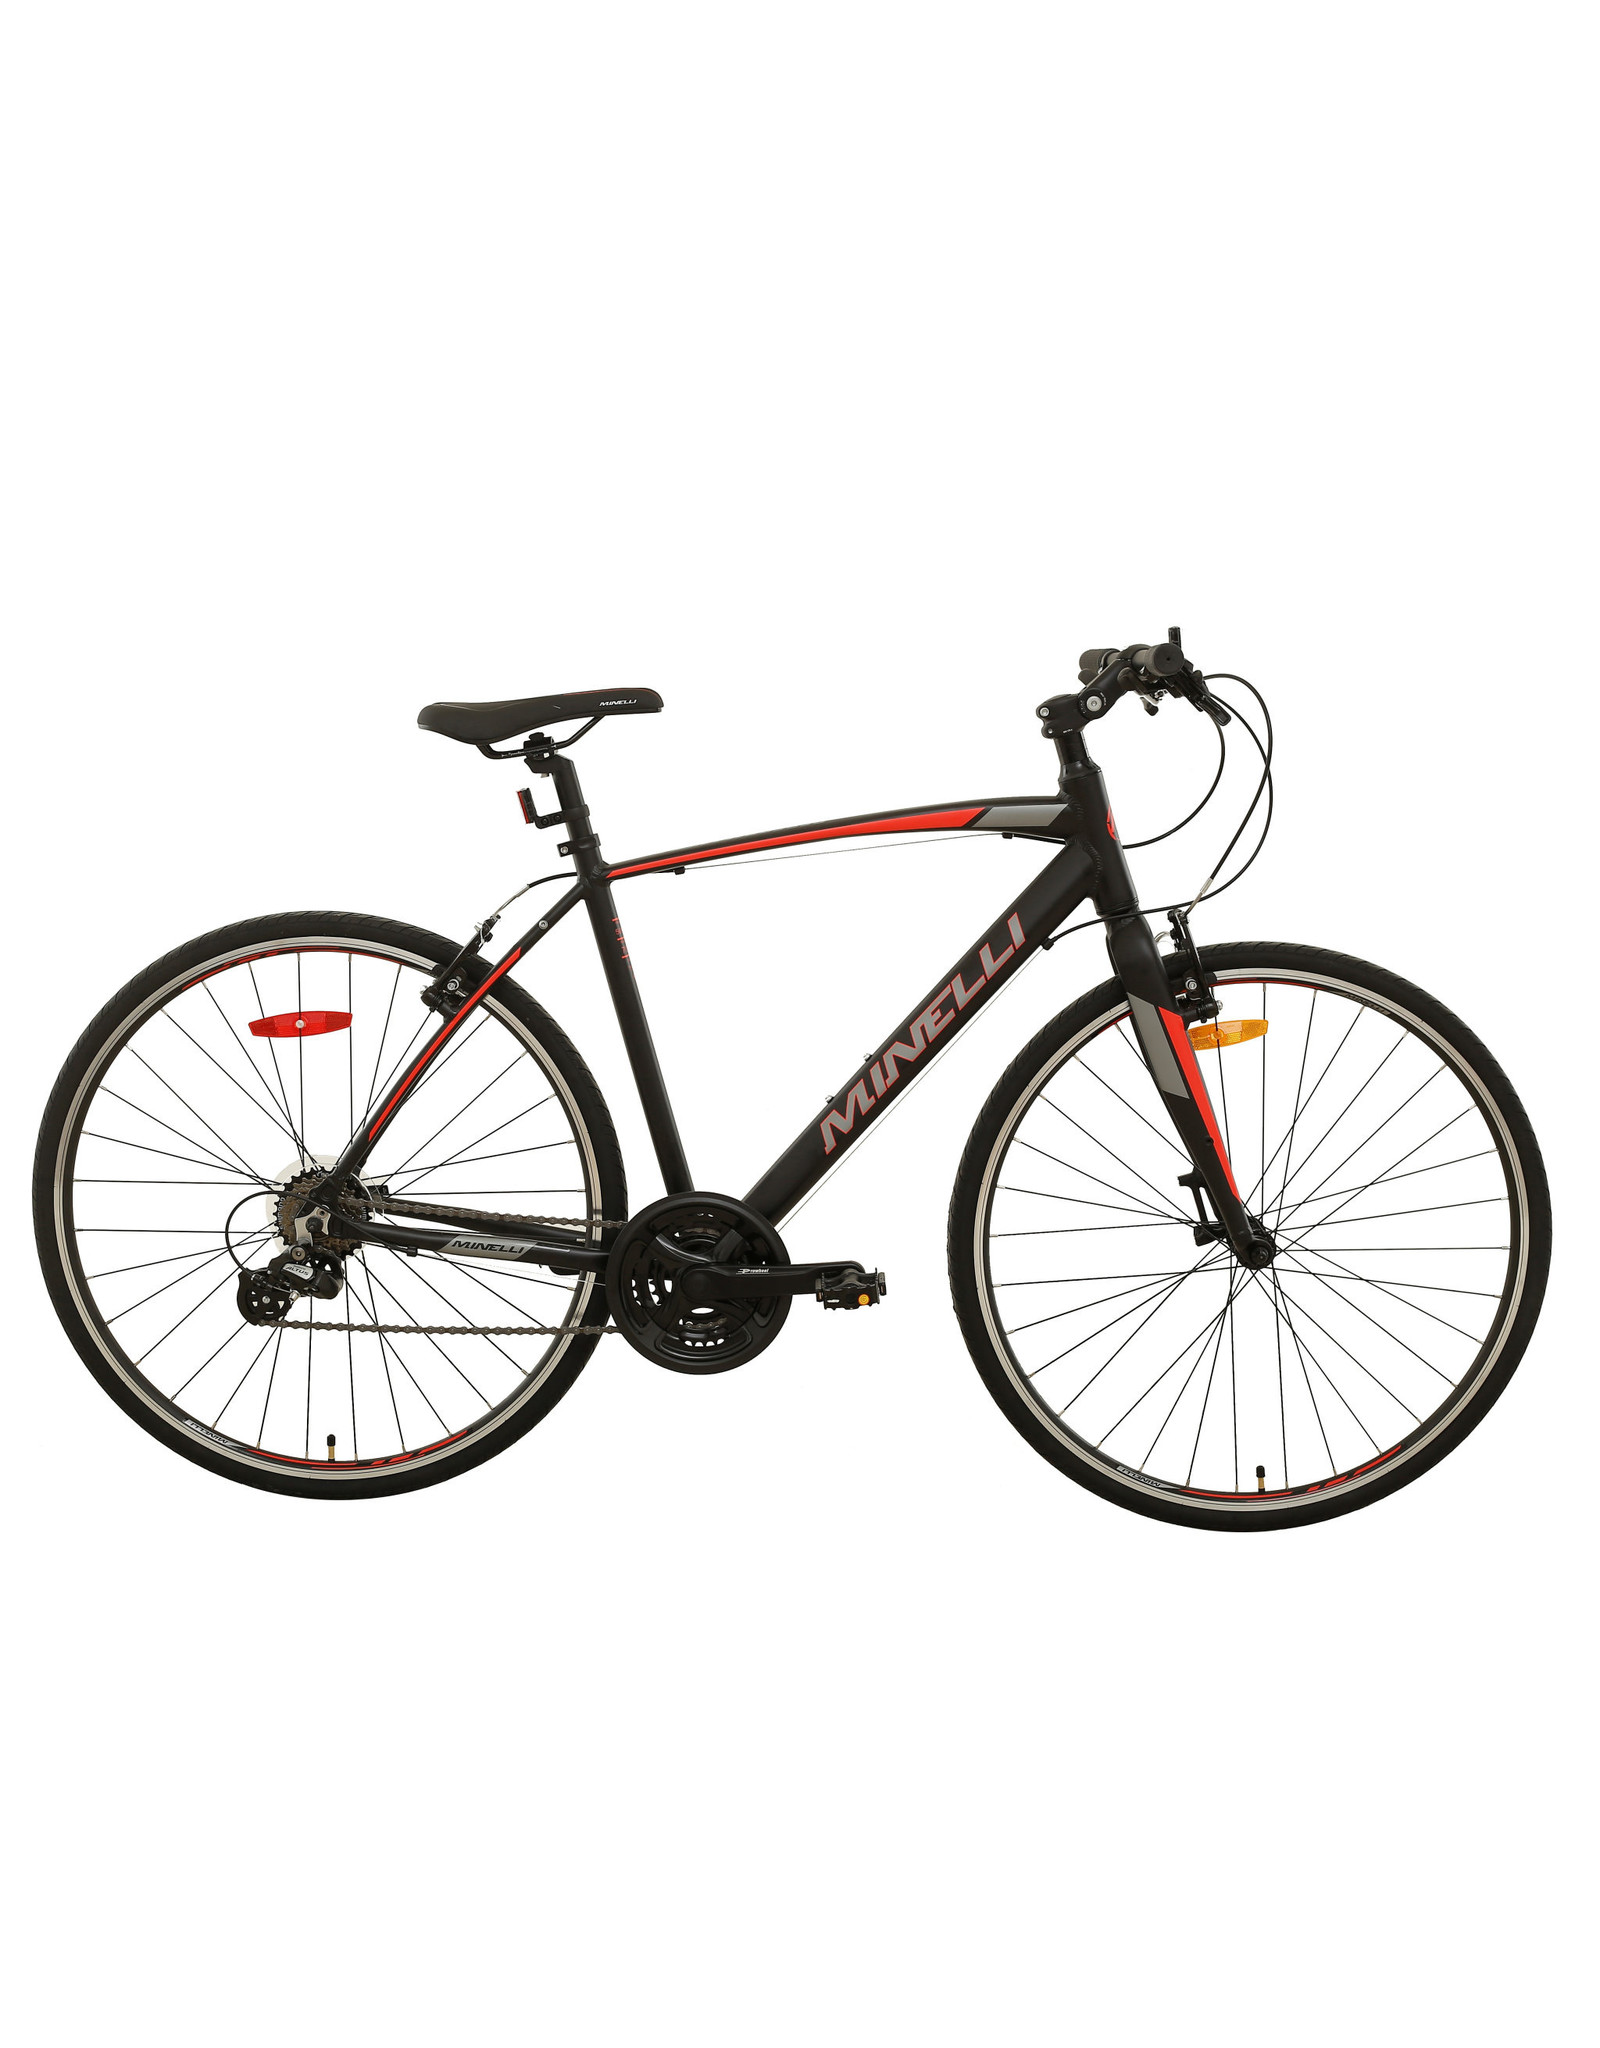 Minelli Hybrid Bike - MINELLI Performance 1